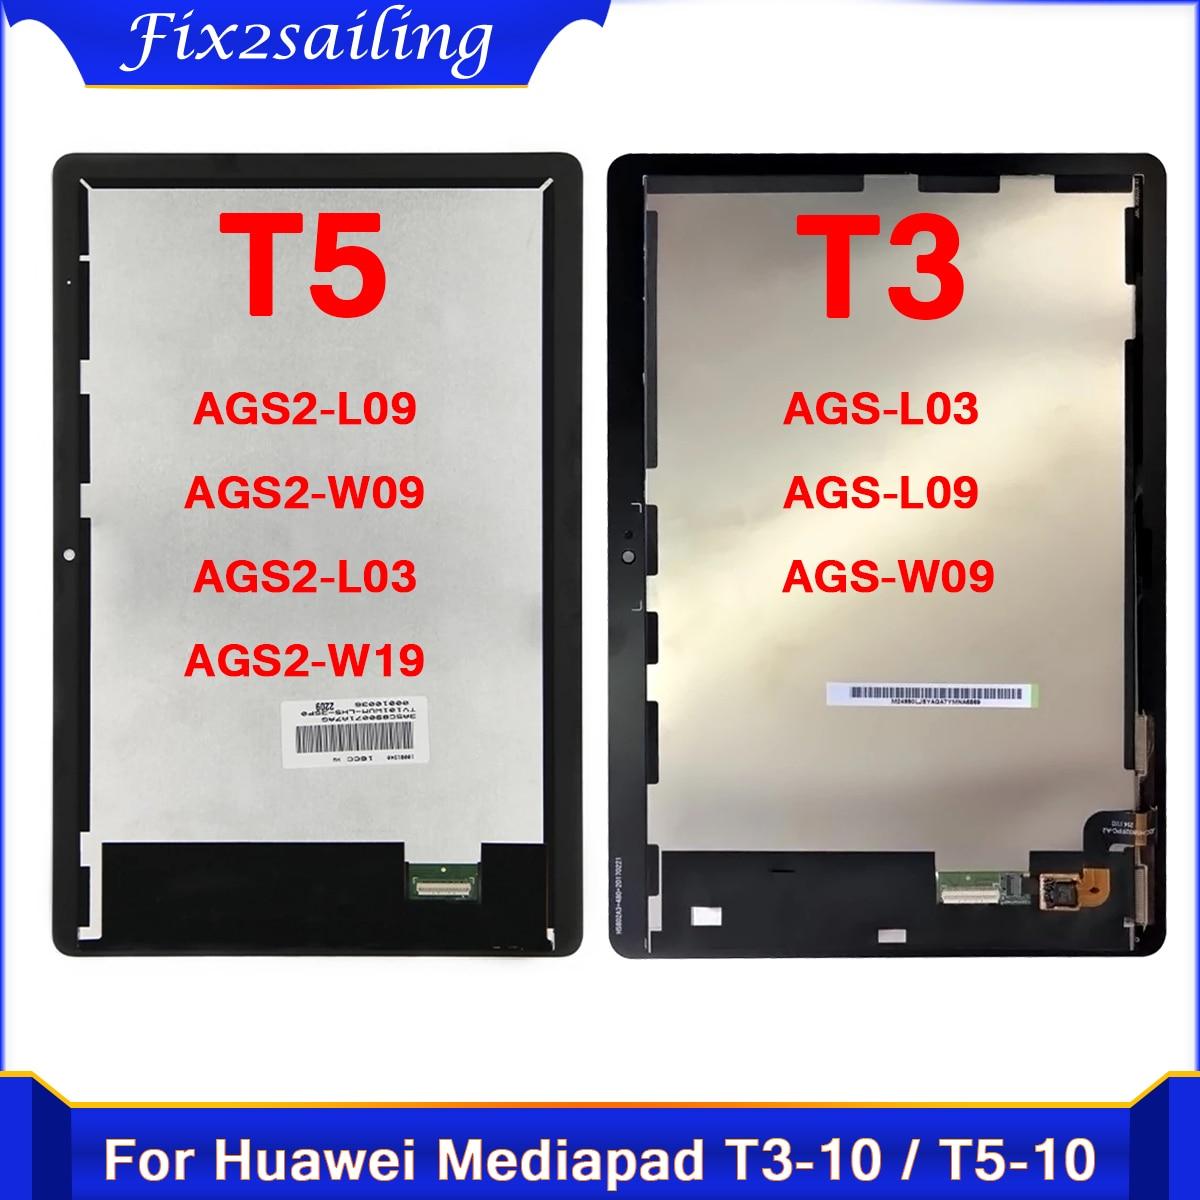 Prueba de pantalla LCD para Huawei MediaPad T3 T5 10 AGS-L03 AGS-L09 AGS-W09 AGS2-L09 AGS2-W09 AGS2-L03 MONTAJE DE digitalizador con pantalla táctil